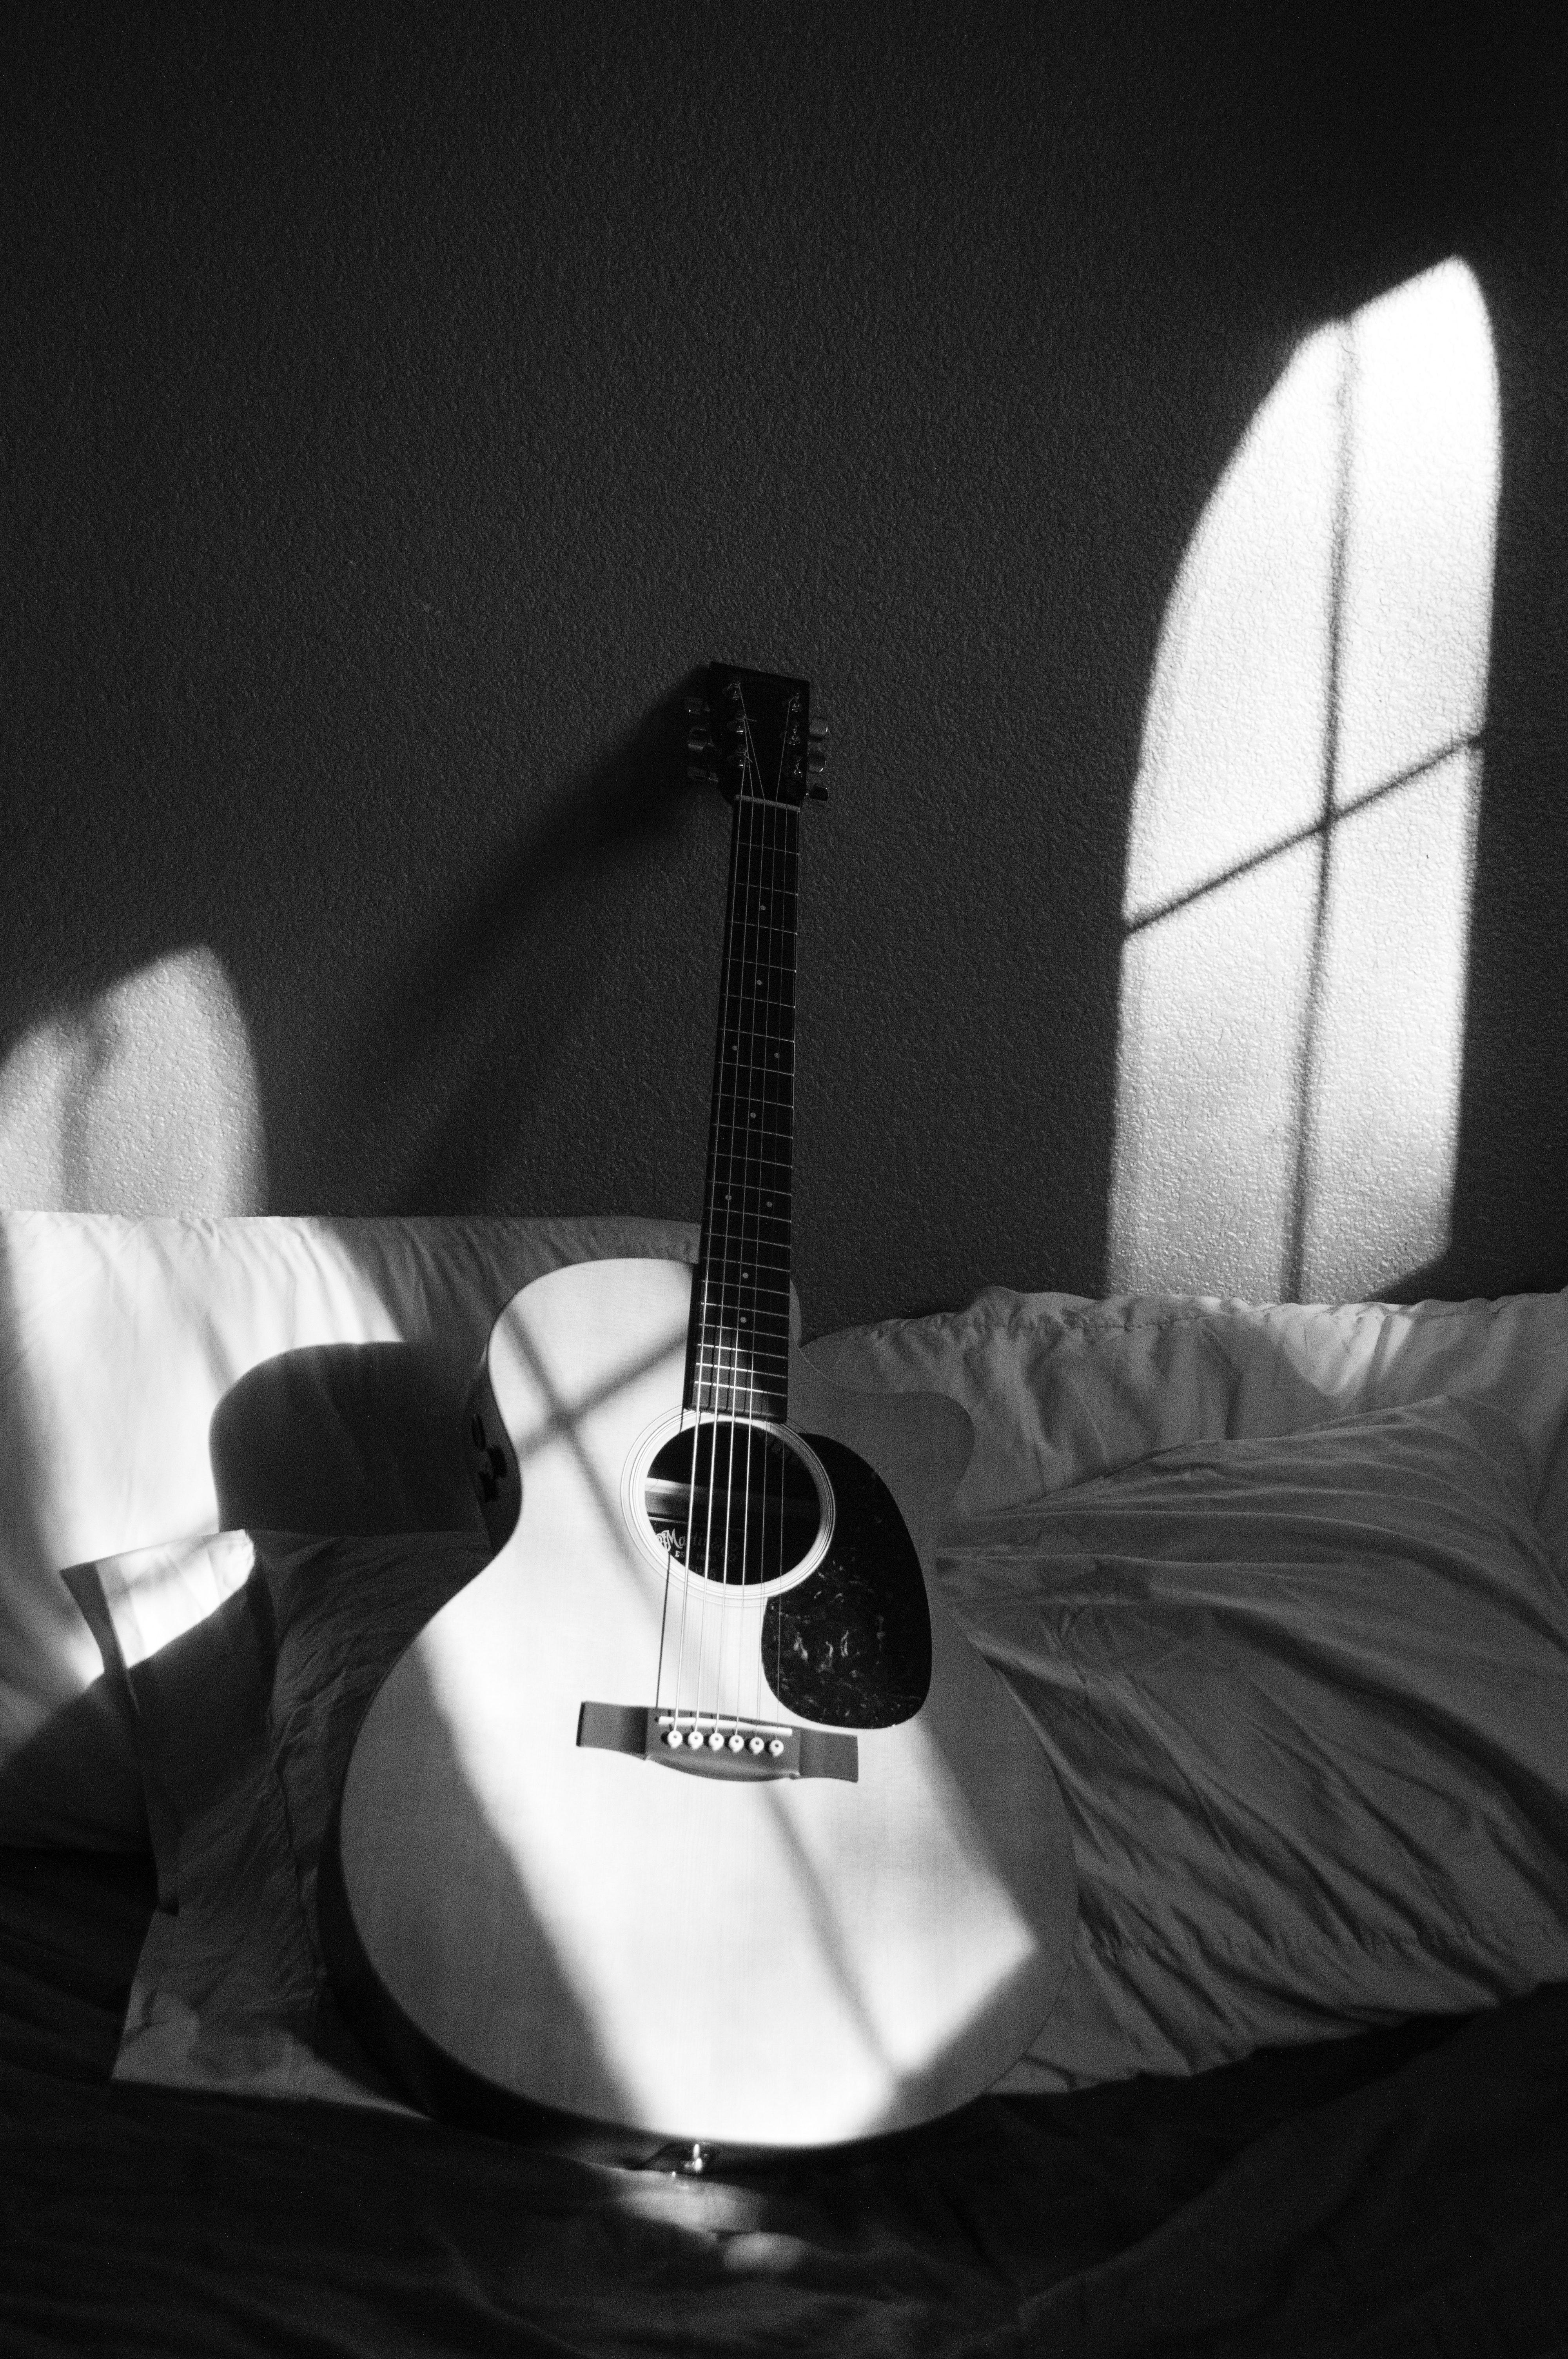 White Acoustic Guitar On Grey And White Textile Free Stock Photo